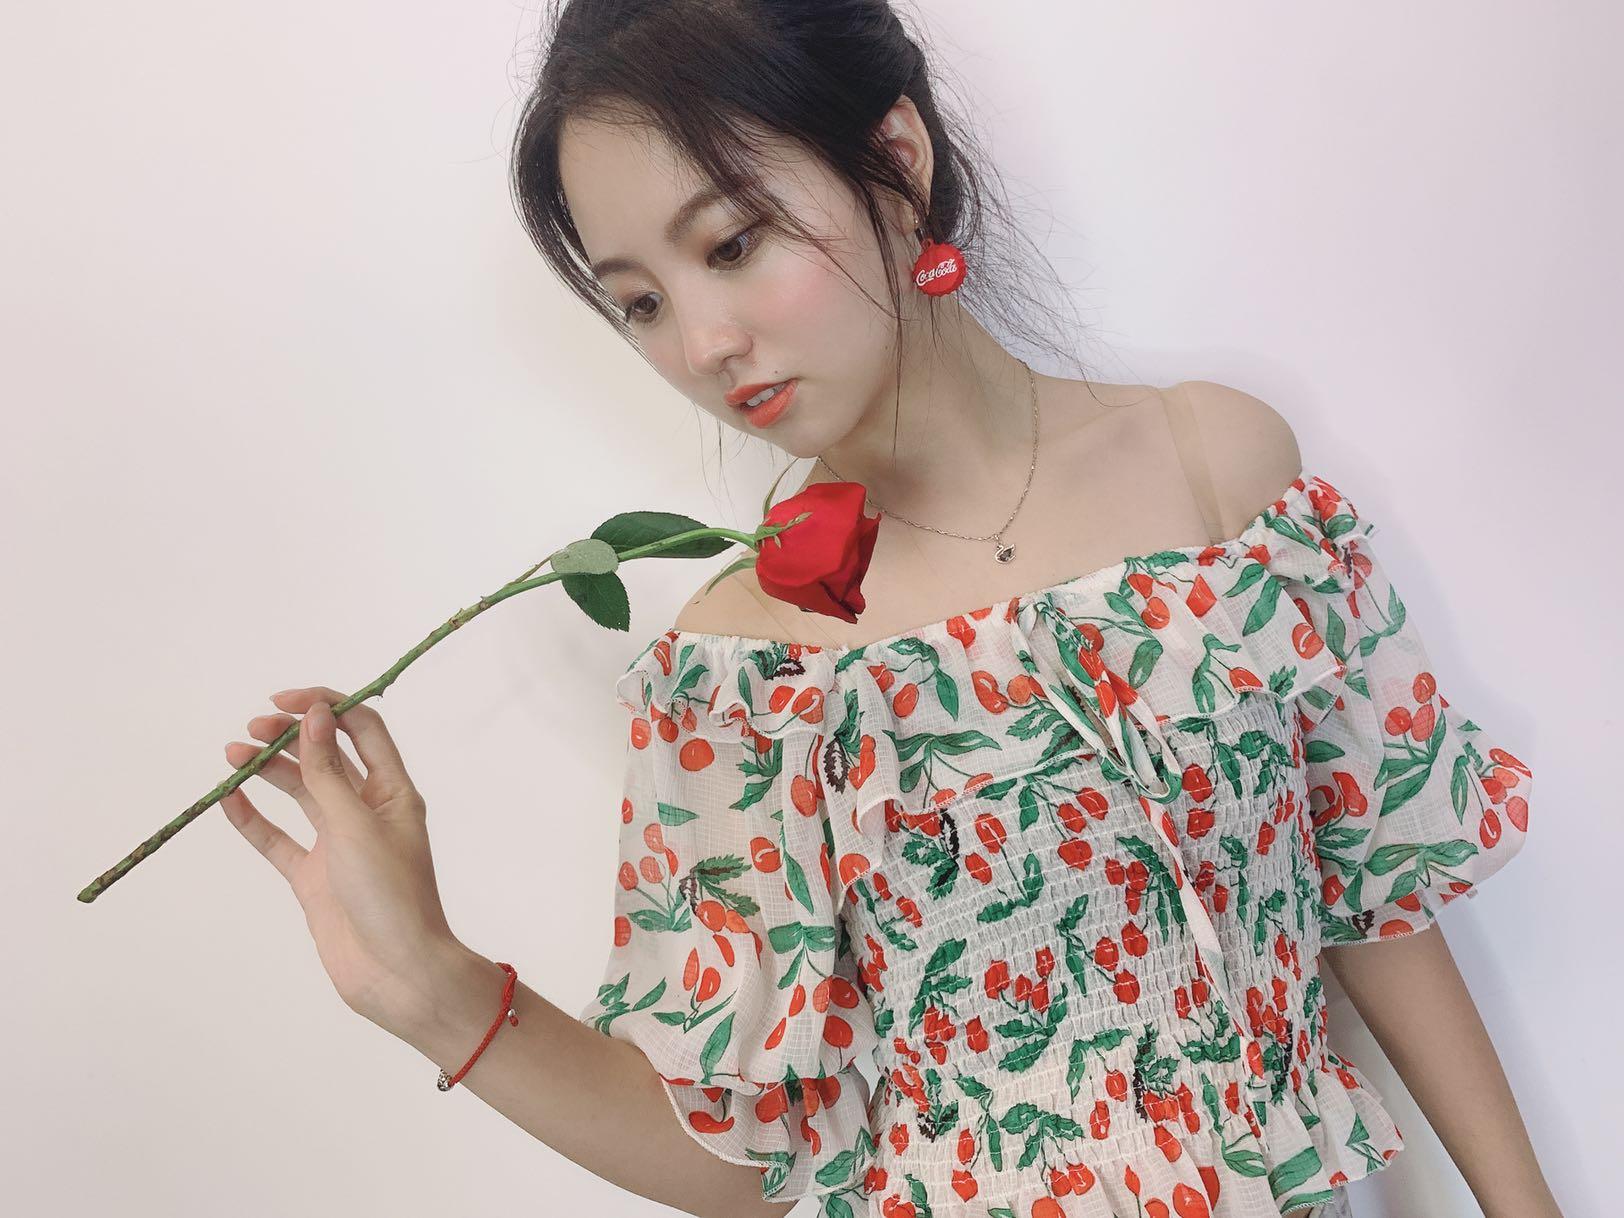 ONLY衣2019夏季女装新款高腰修身一字肩饰小樱桃雪纺短款衬衫